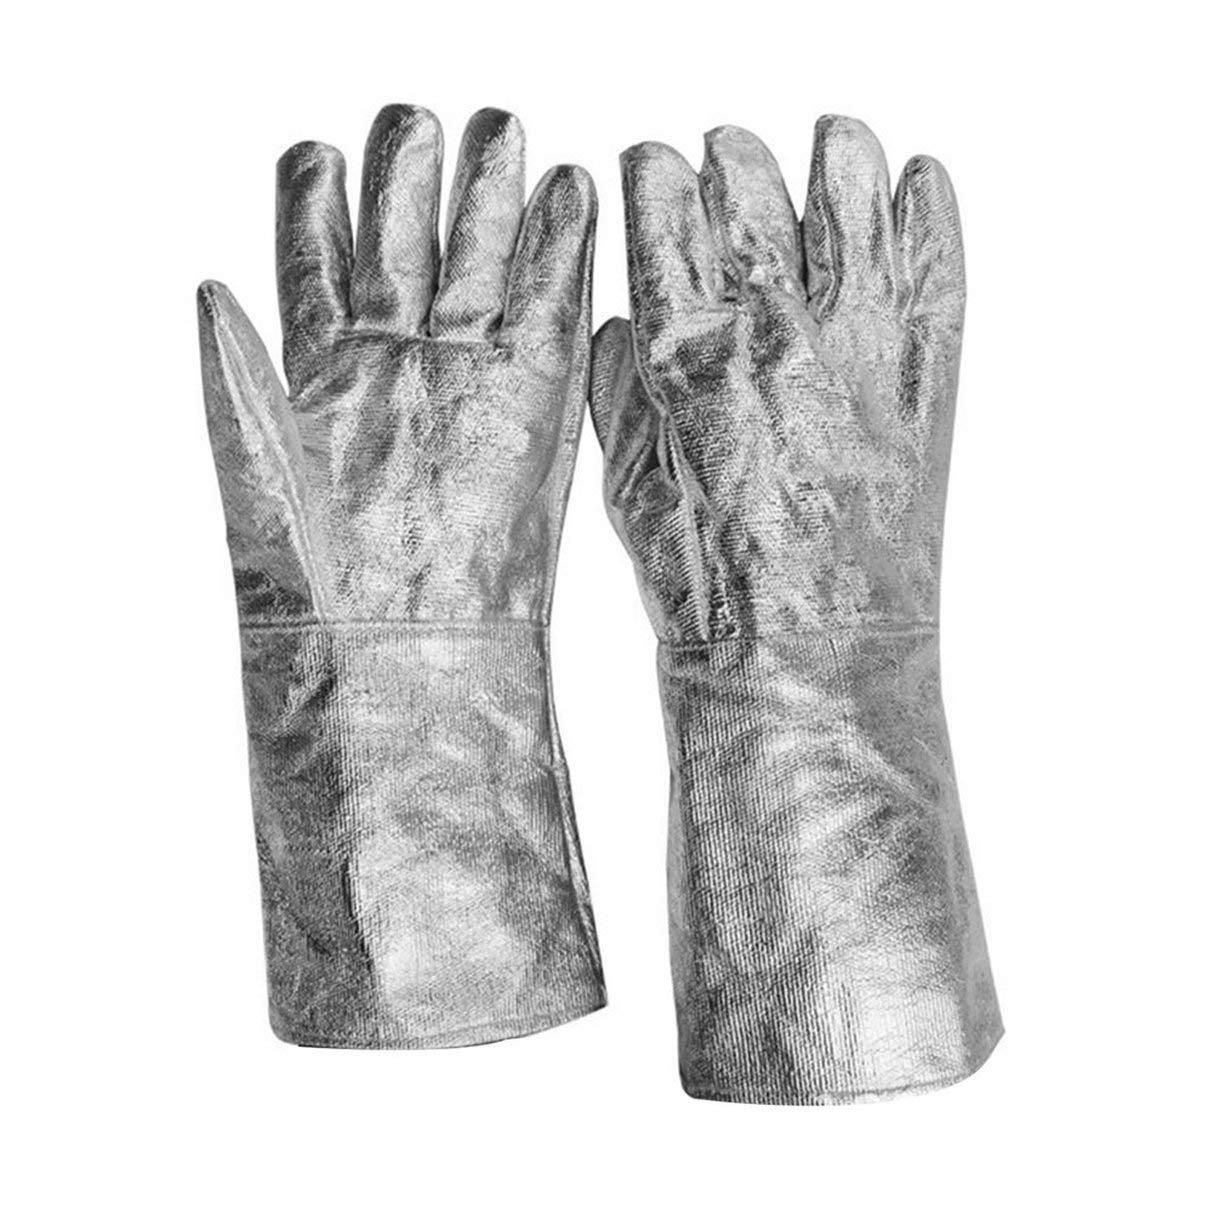 A Pair/Set Aluminum Foil Fireproof Gloves Flexible Full Finger Heat Insulation Gloves Fire Resistant Safety Gloves